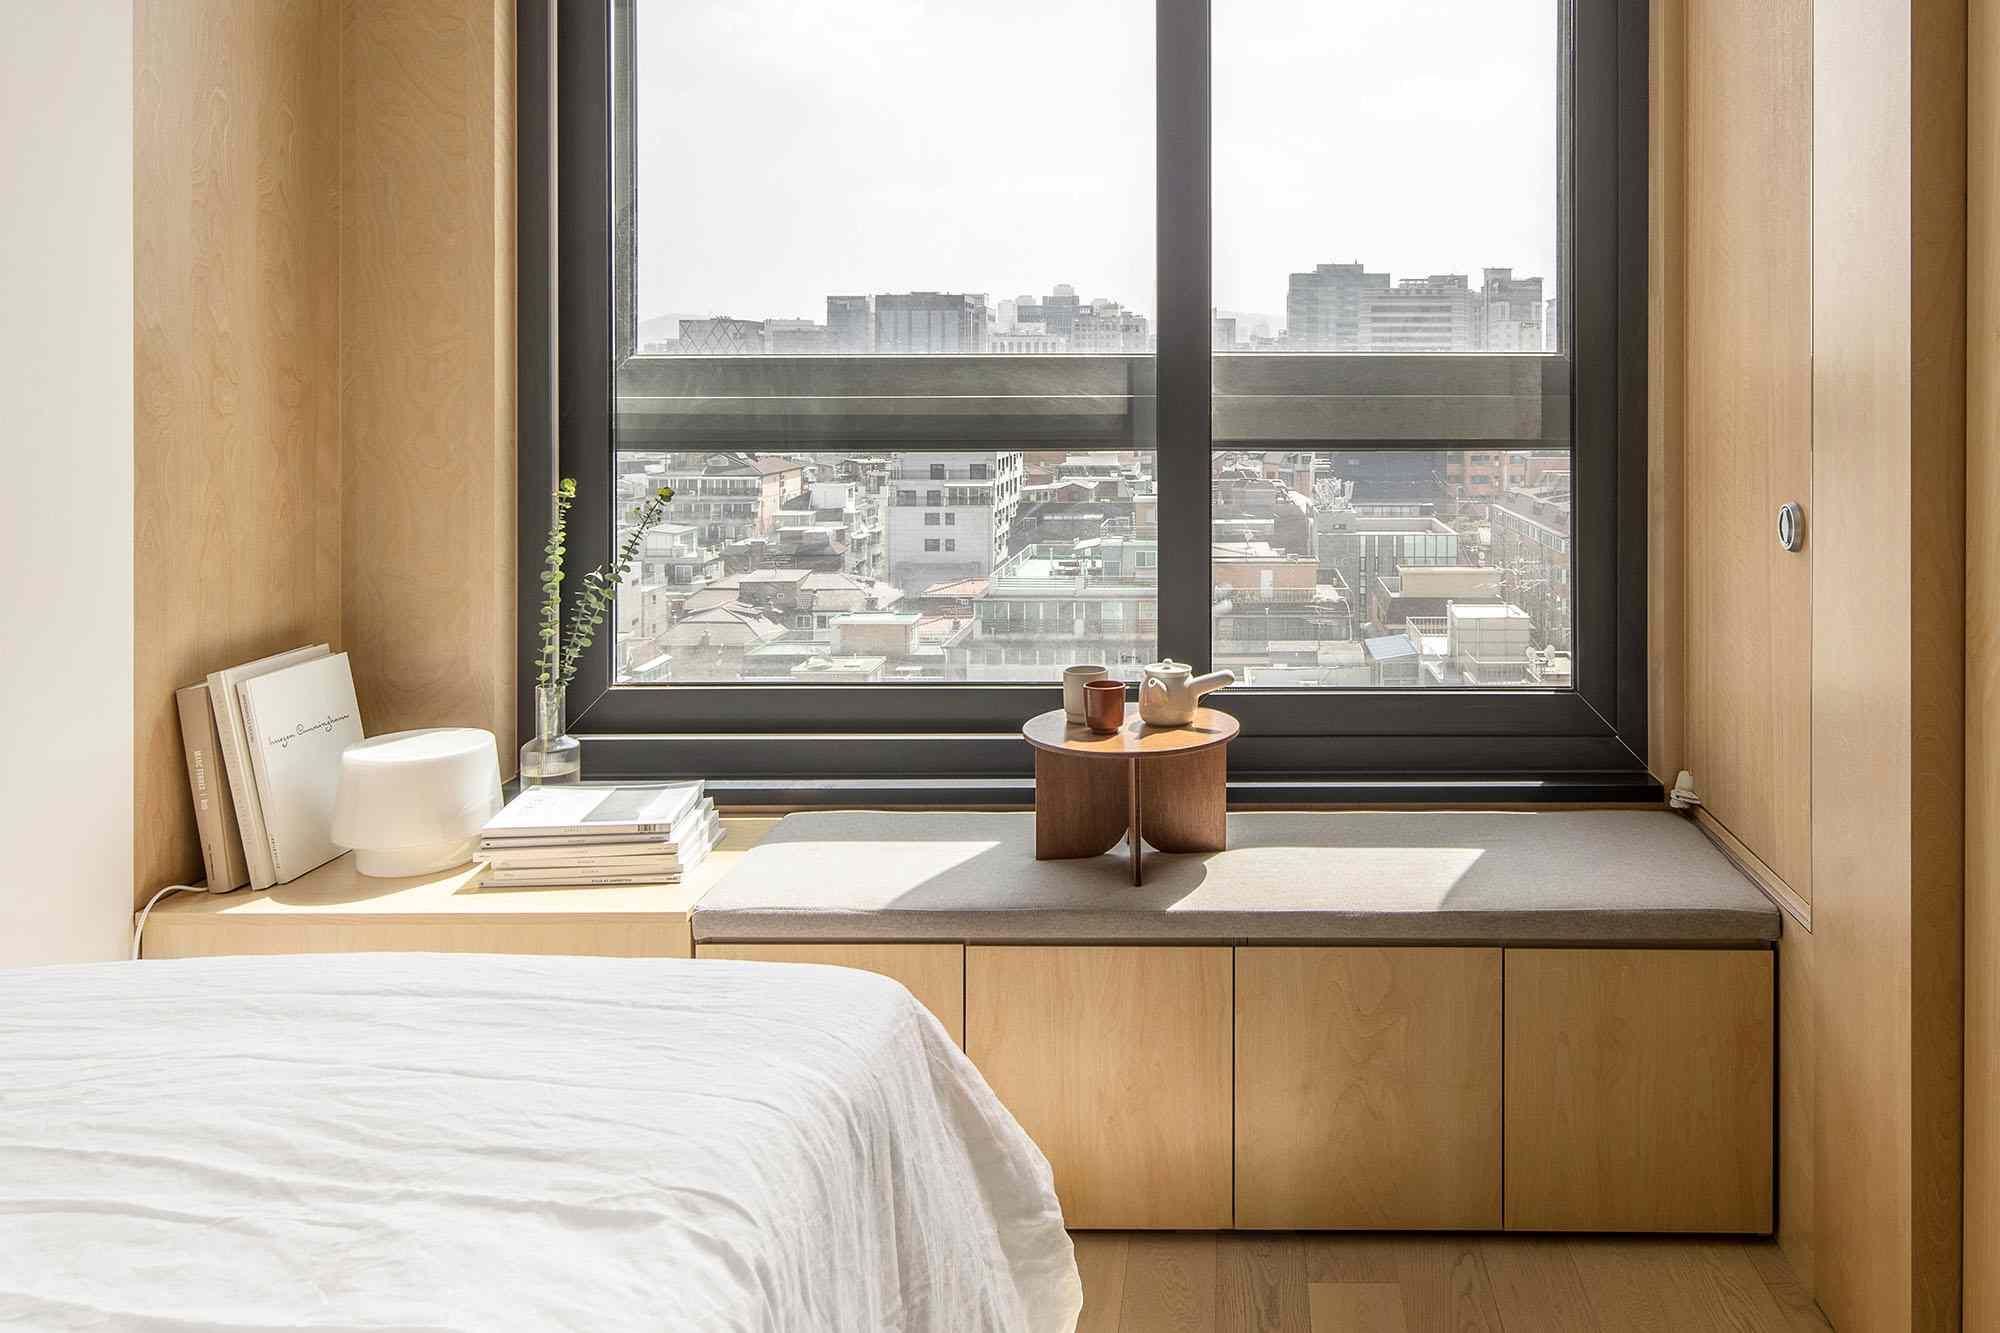 LIFE micro-apartments coliving Ian Lee interior